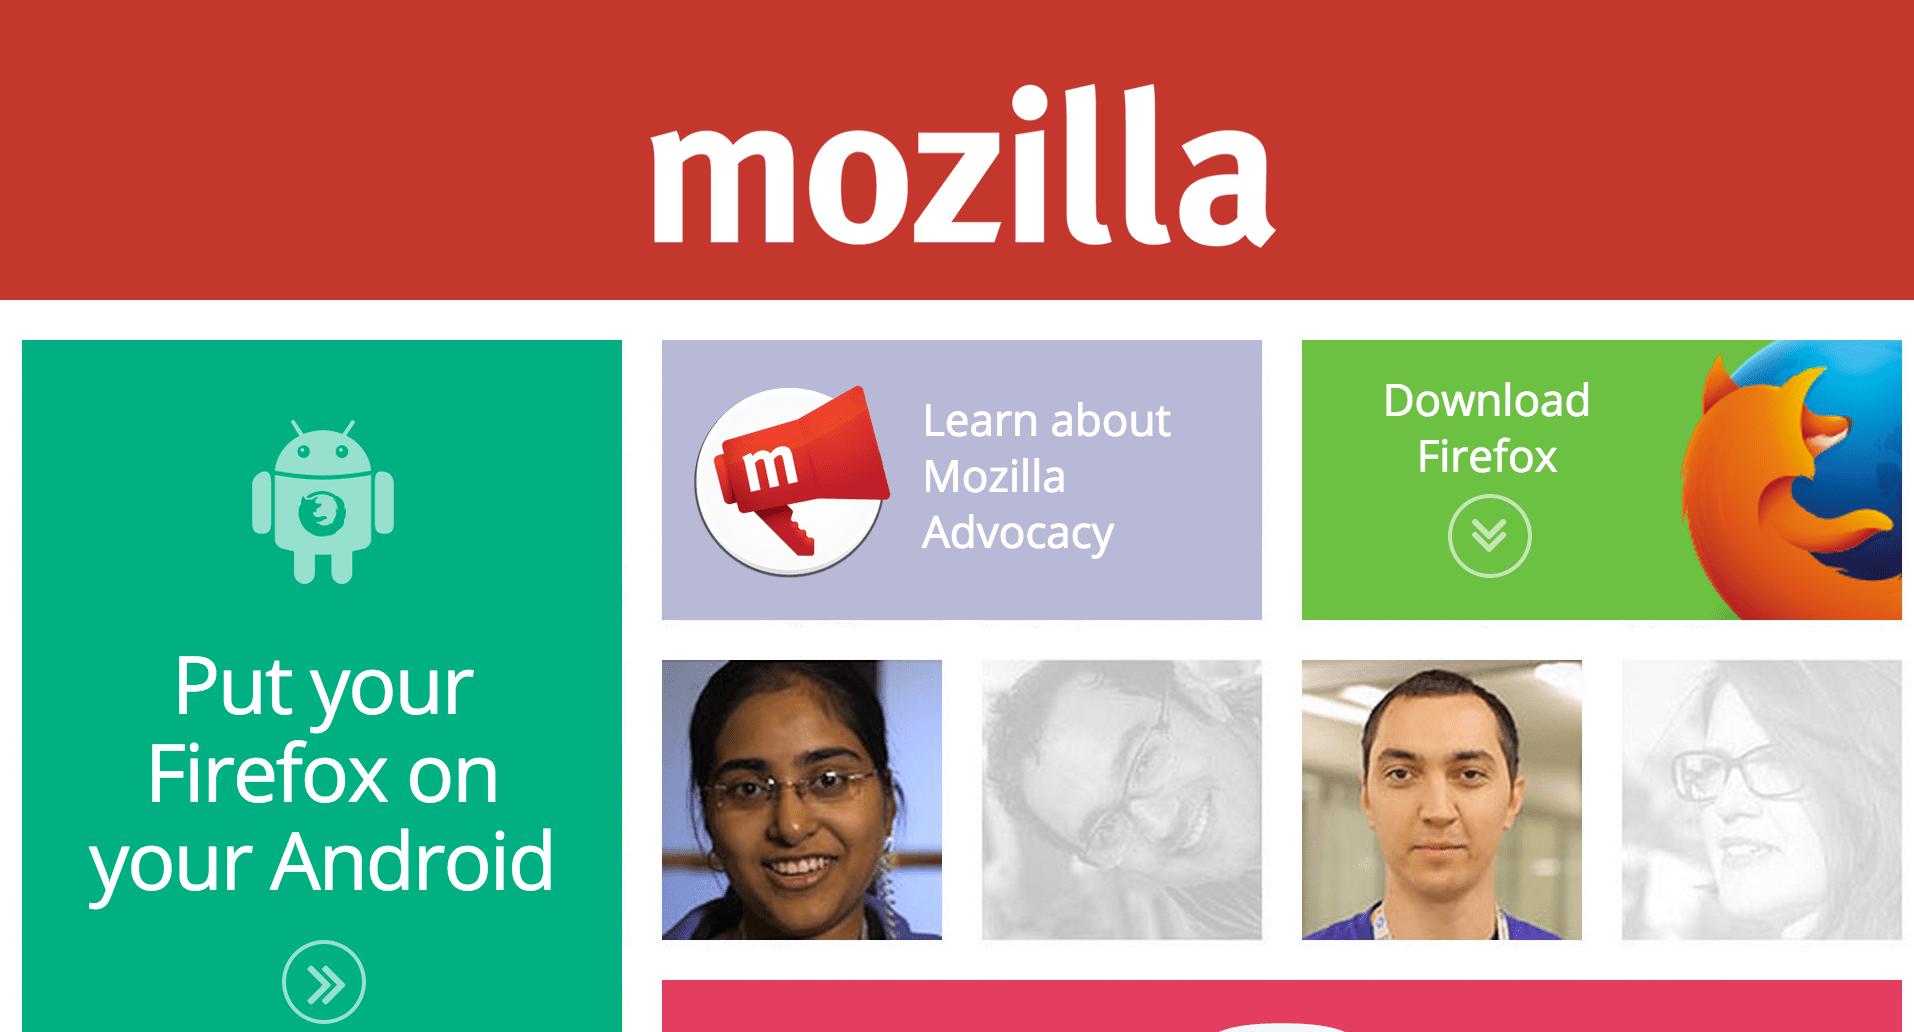 mozilla-website-screenshot